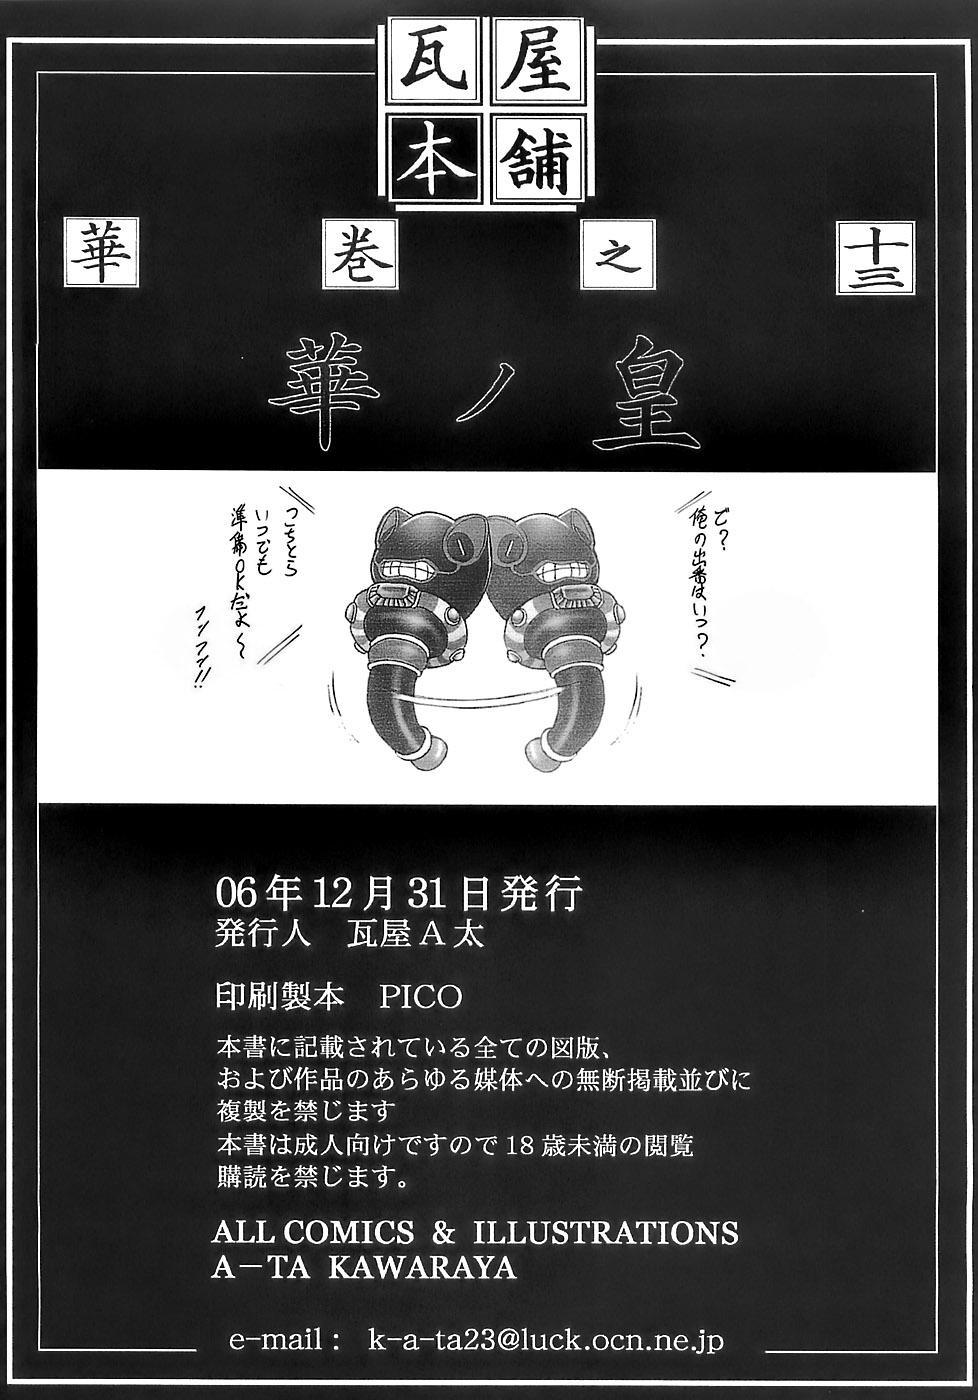 (C71) [Kawaraya Honpo (Kawaraya A-ta)] Hana - Maki no Juusan - Hana no Sumeragi (Queen's Blade) 41